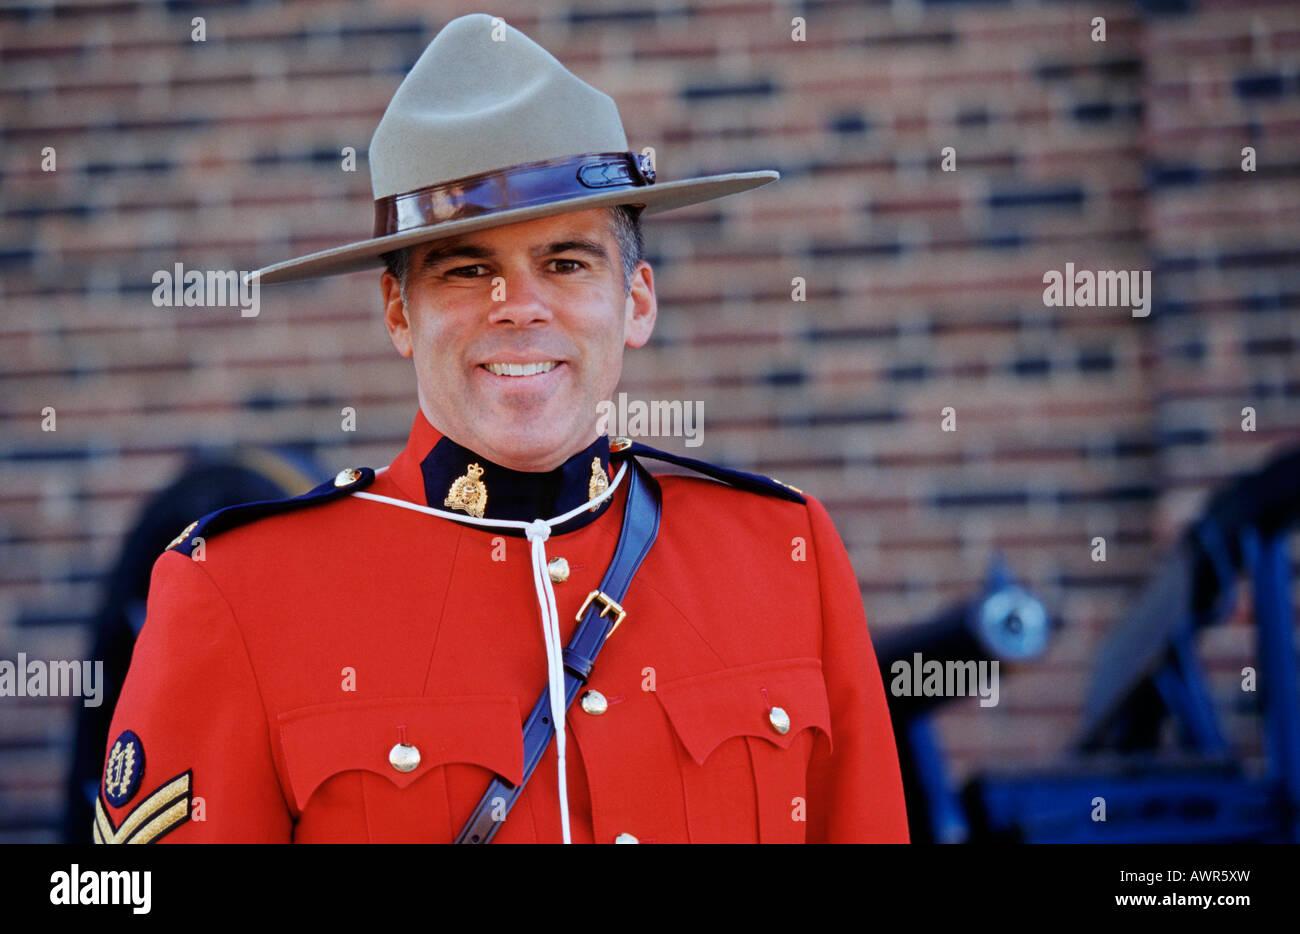 Policewoman Canada Immagini   Policewoman Canada Fotos Stock - Alamy 8b3399dc22c7